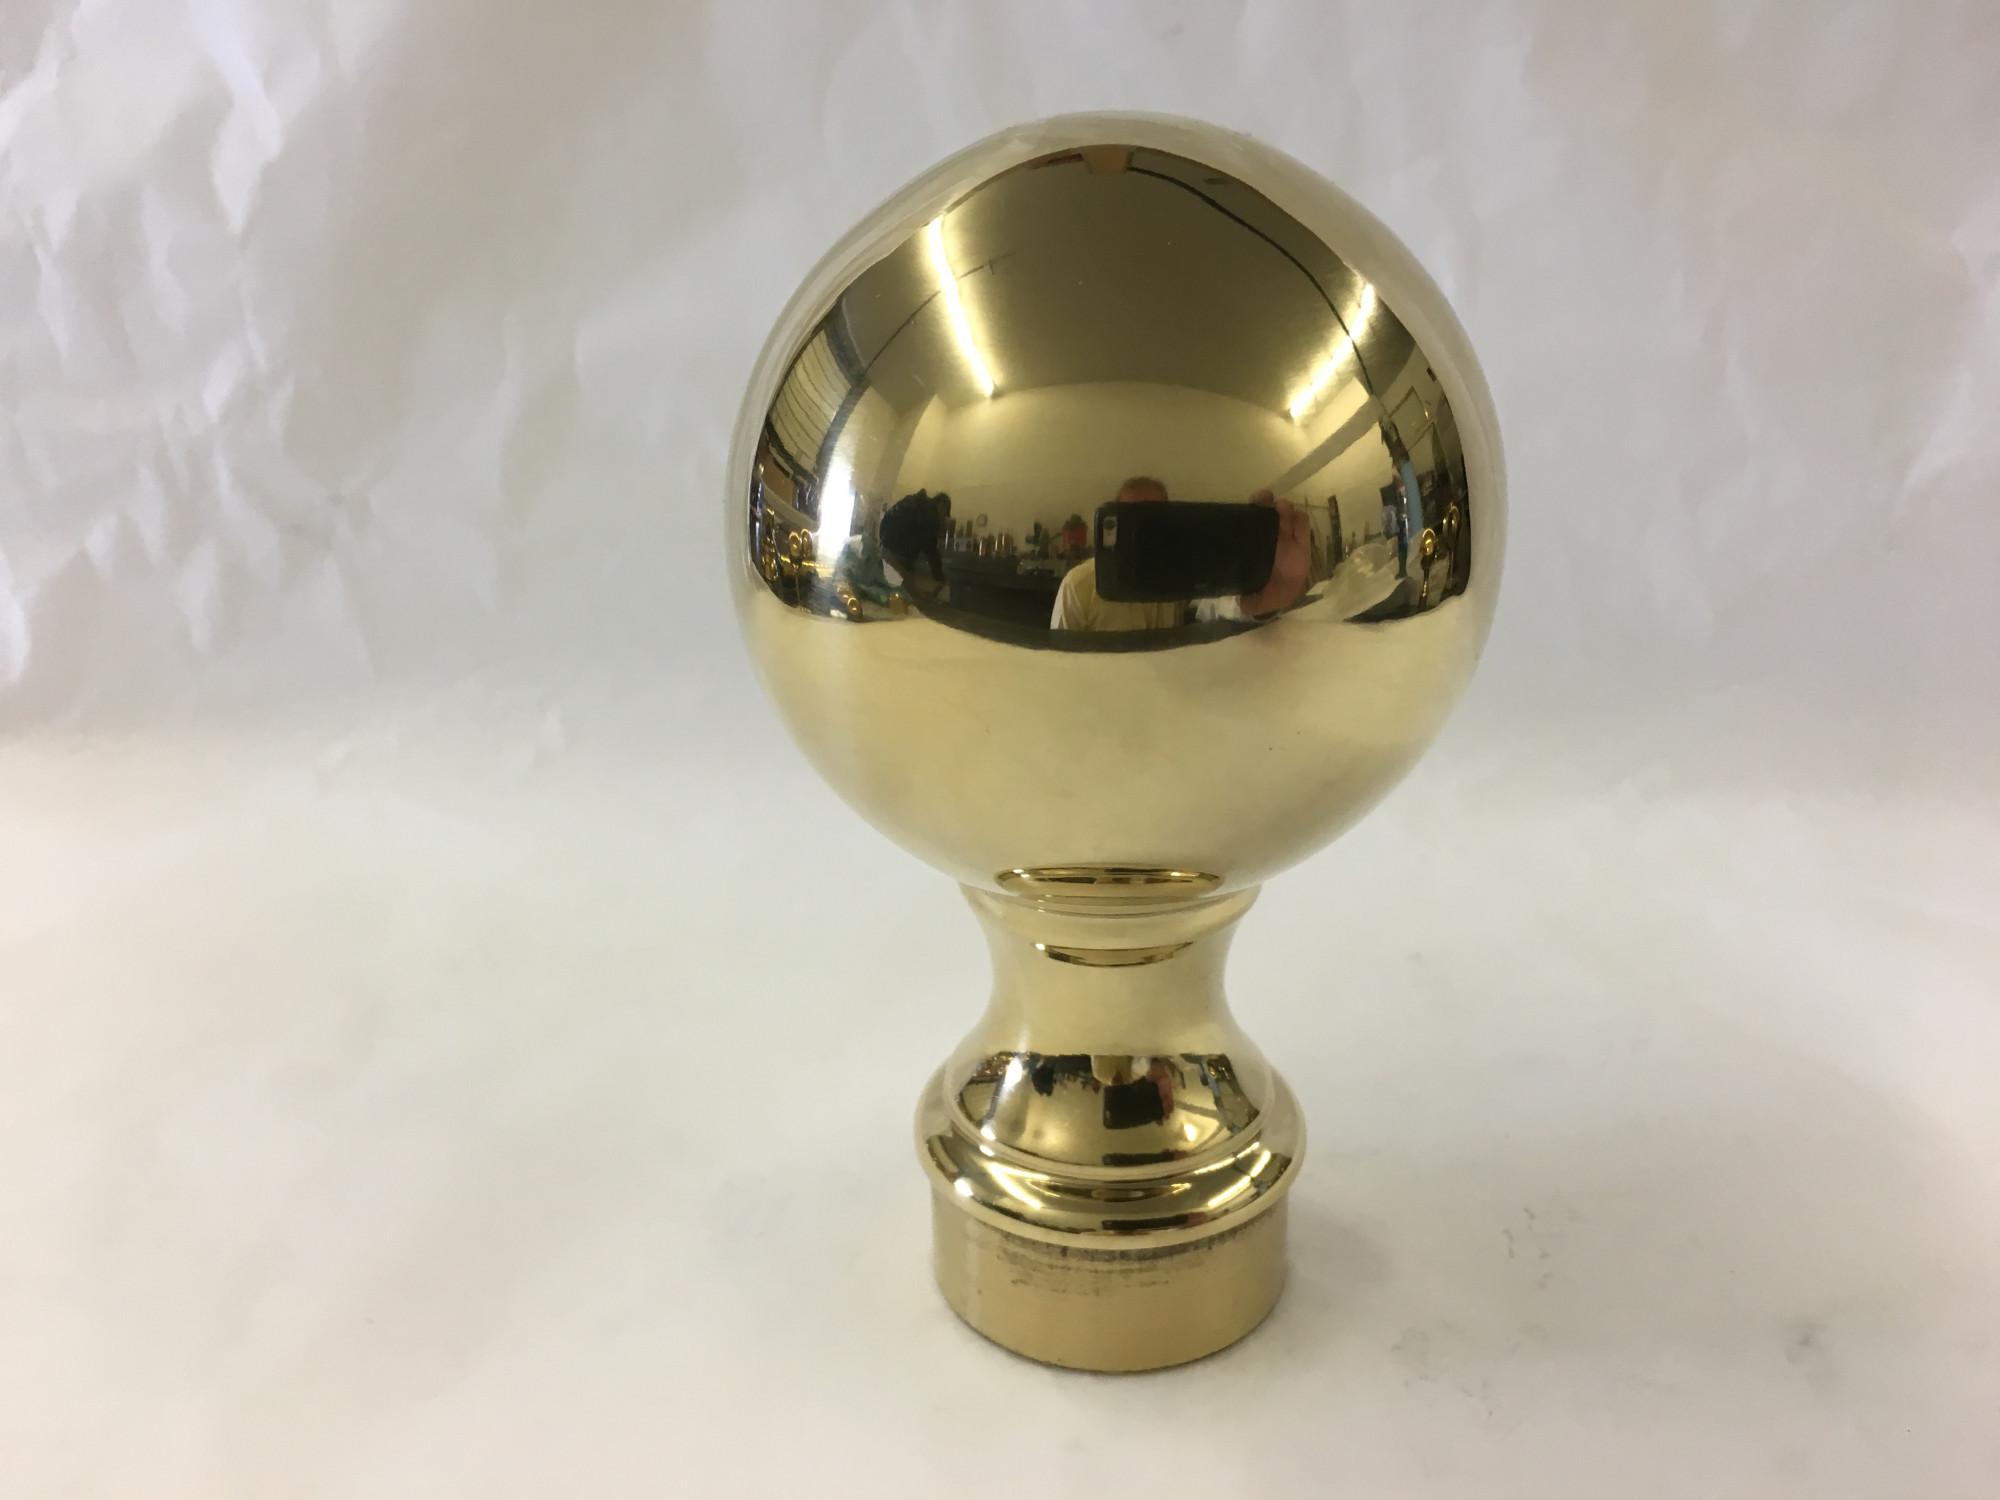 Polished Brass Ball Finial (2 5/8 globe diameter for 1.5 inch tubing)